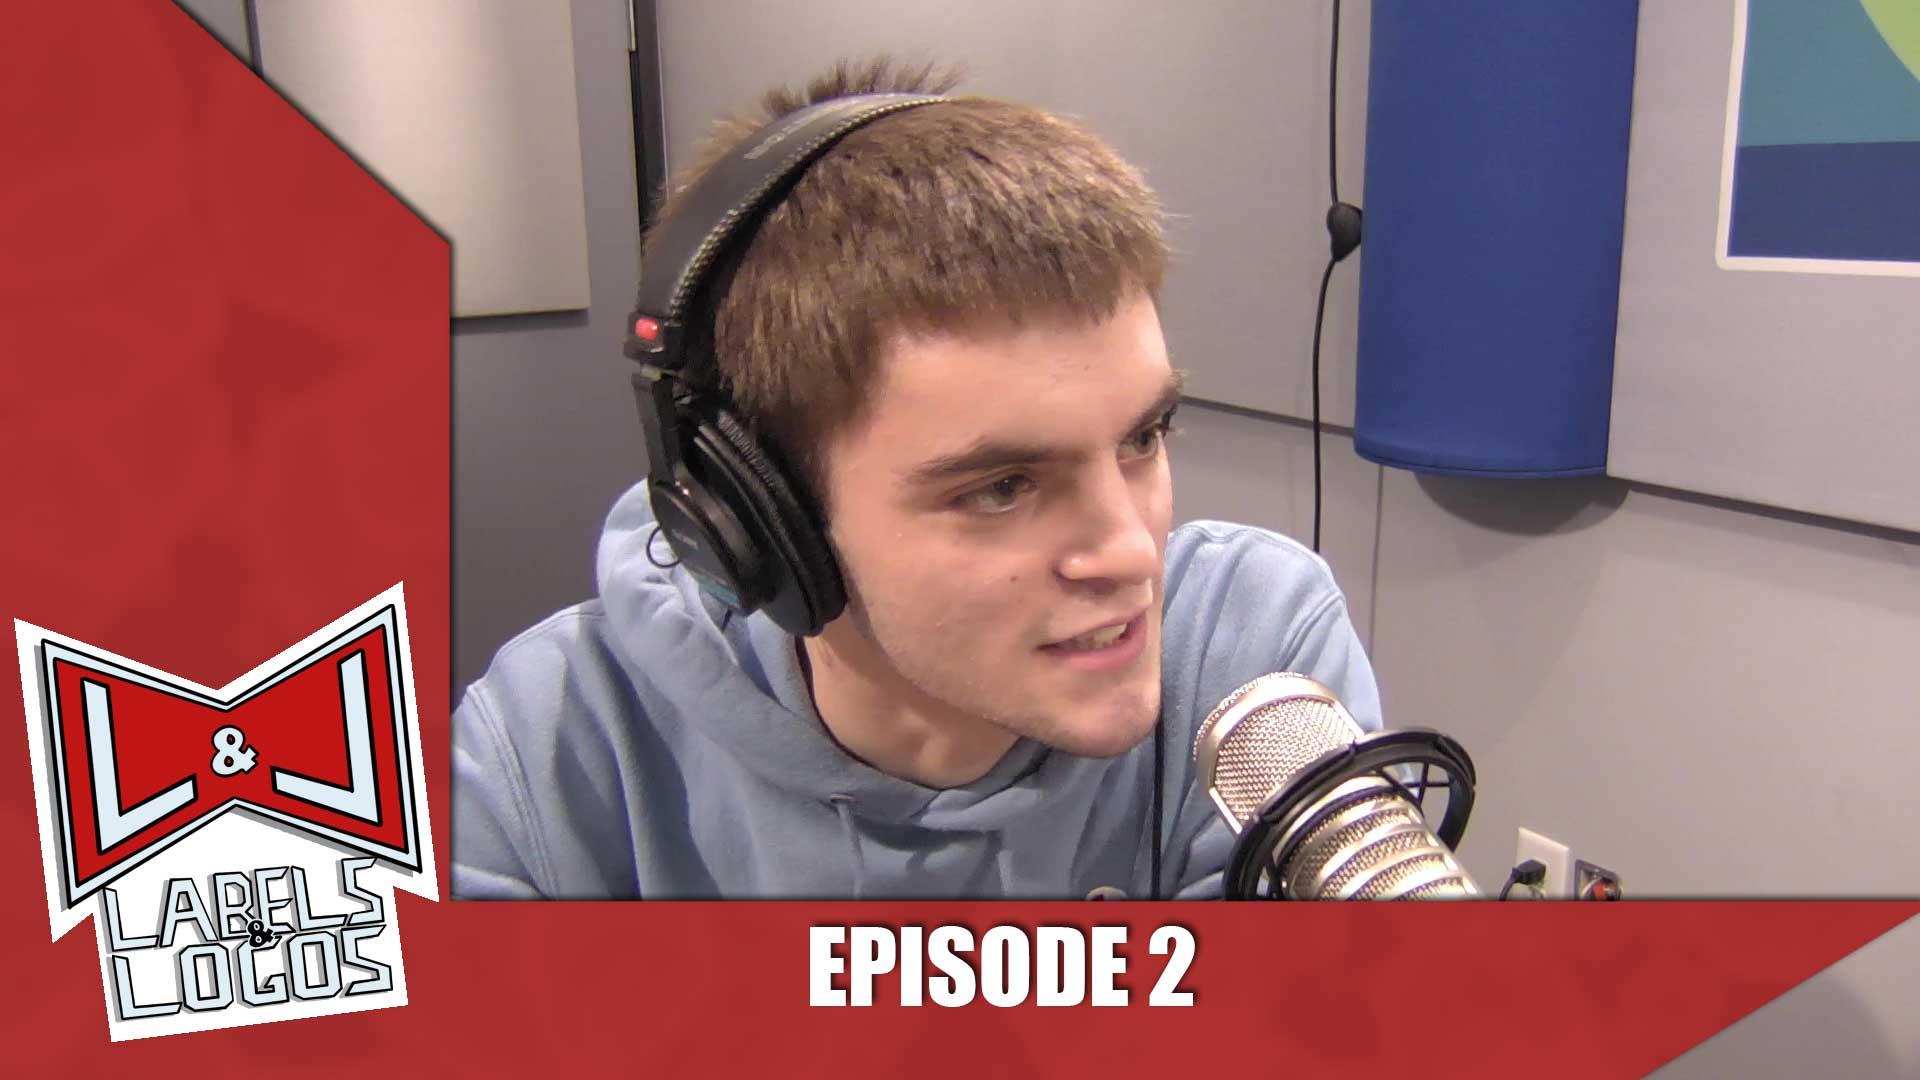 Labels & Logos - Episode 2